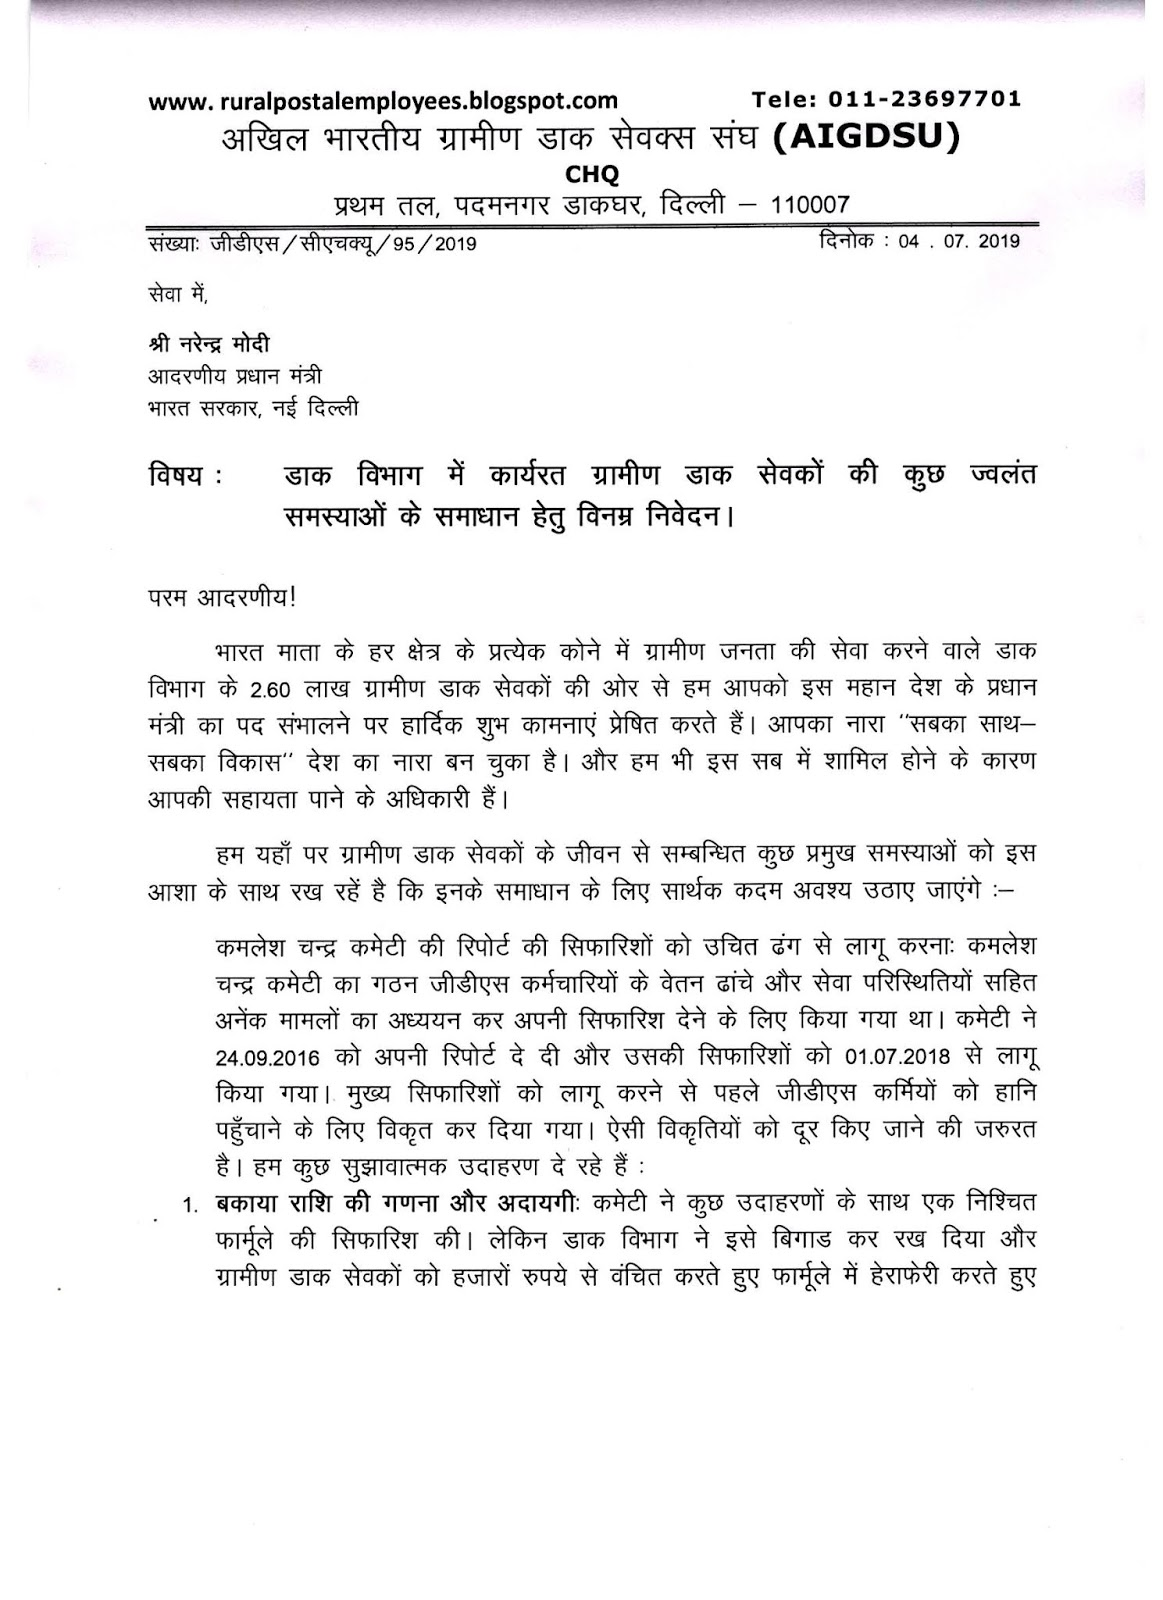 AIGDSU memorandum to prime minister